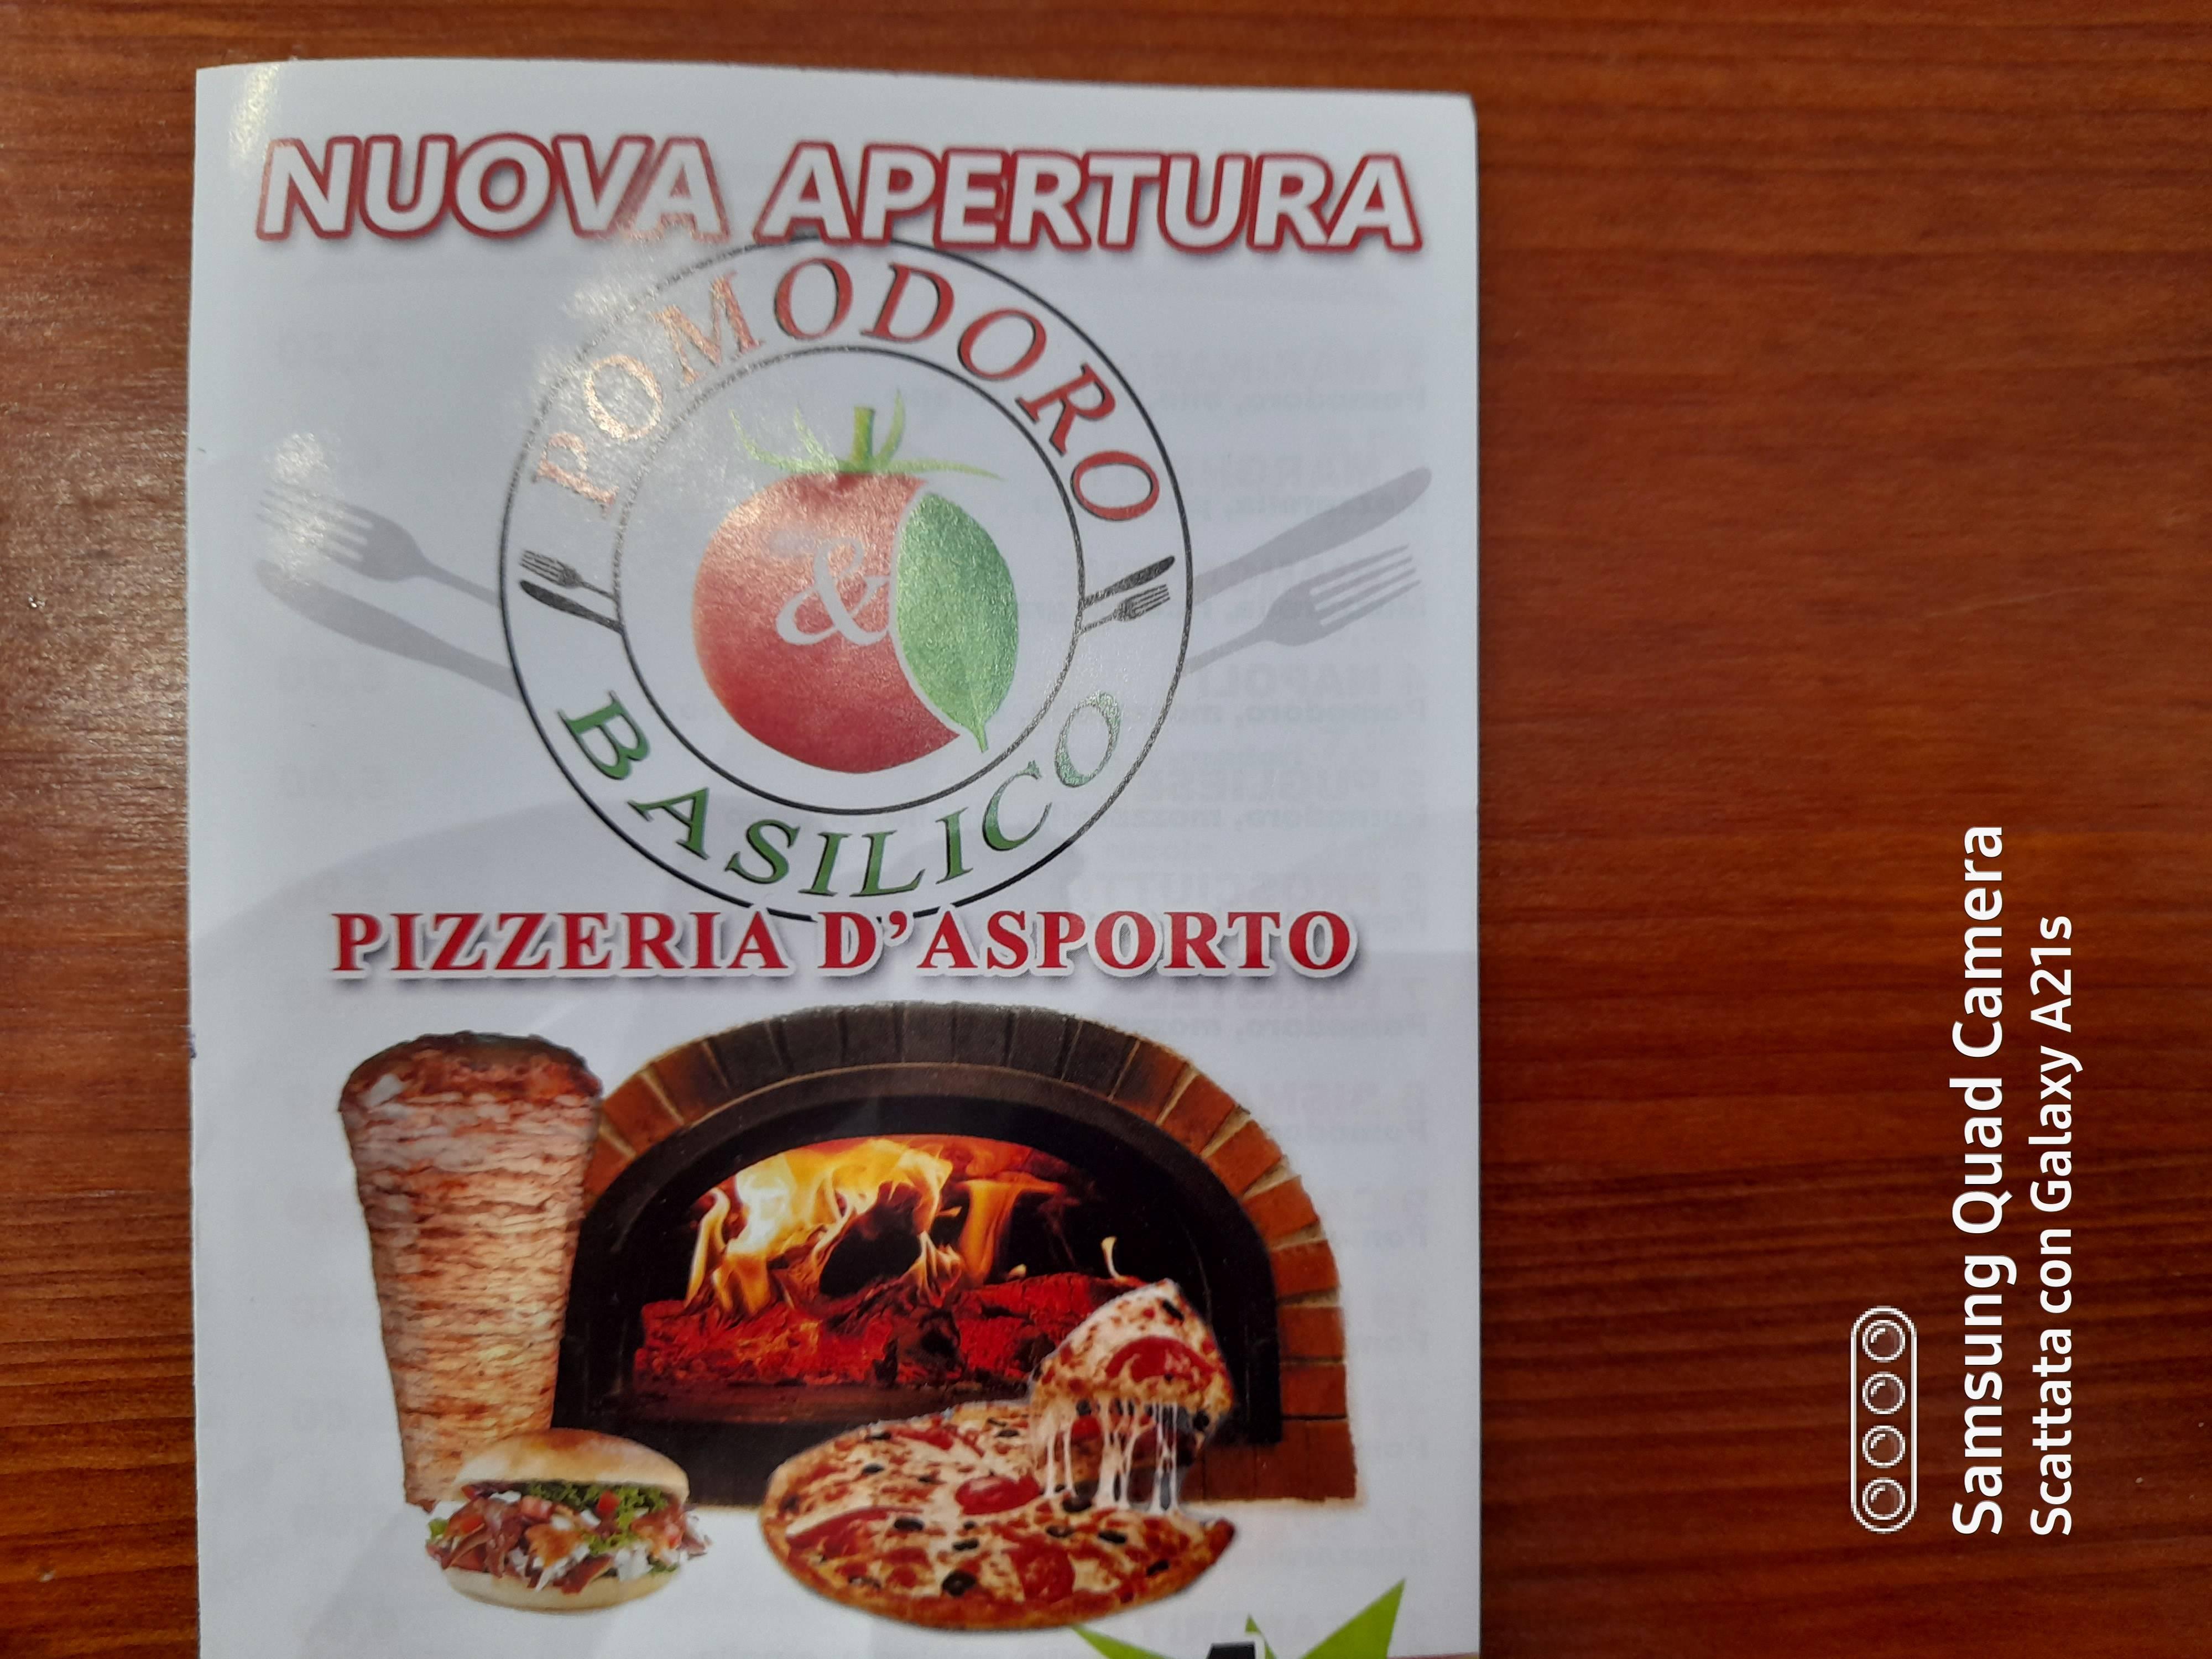 Pizzeria d'asporto Pomodoro e basilico